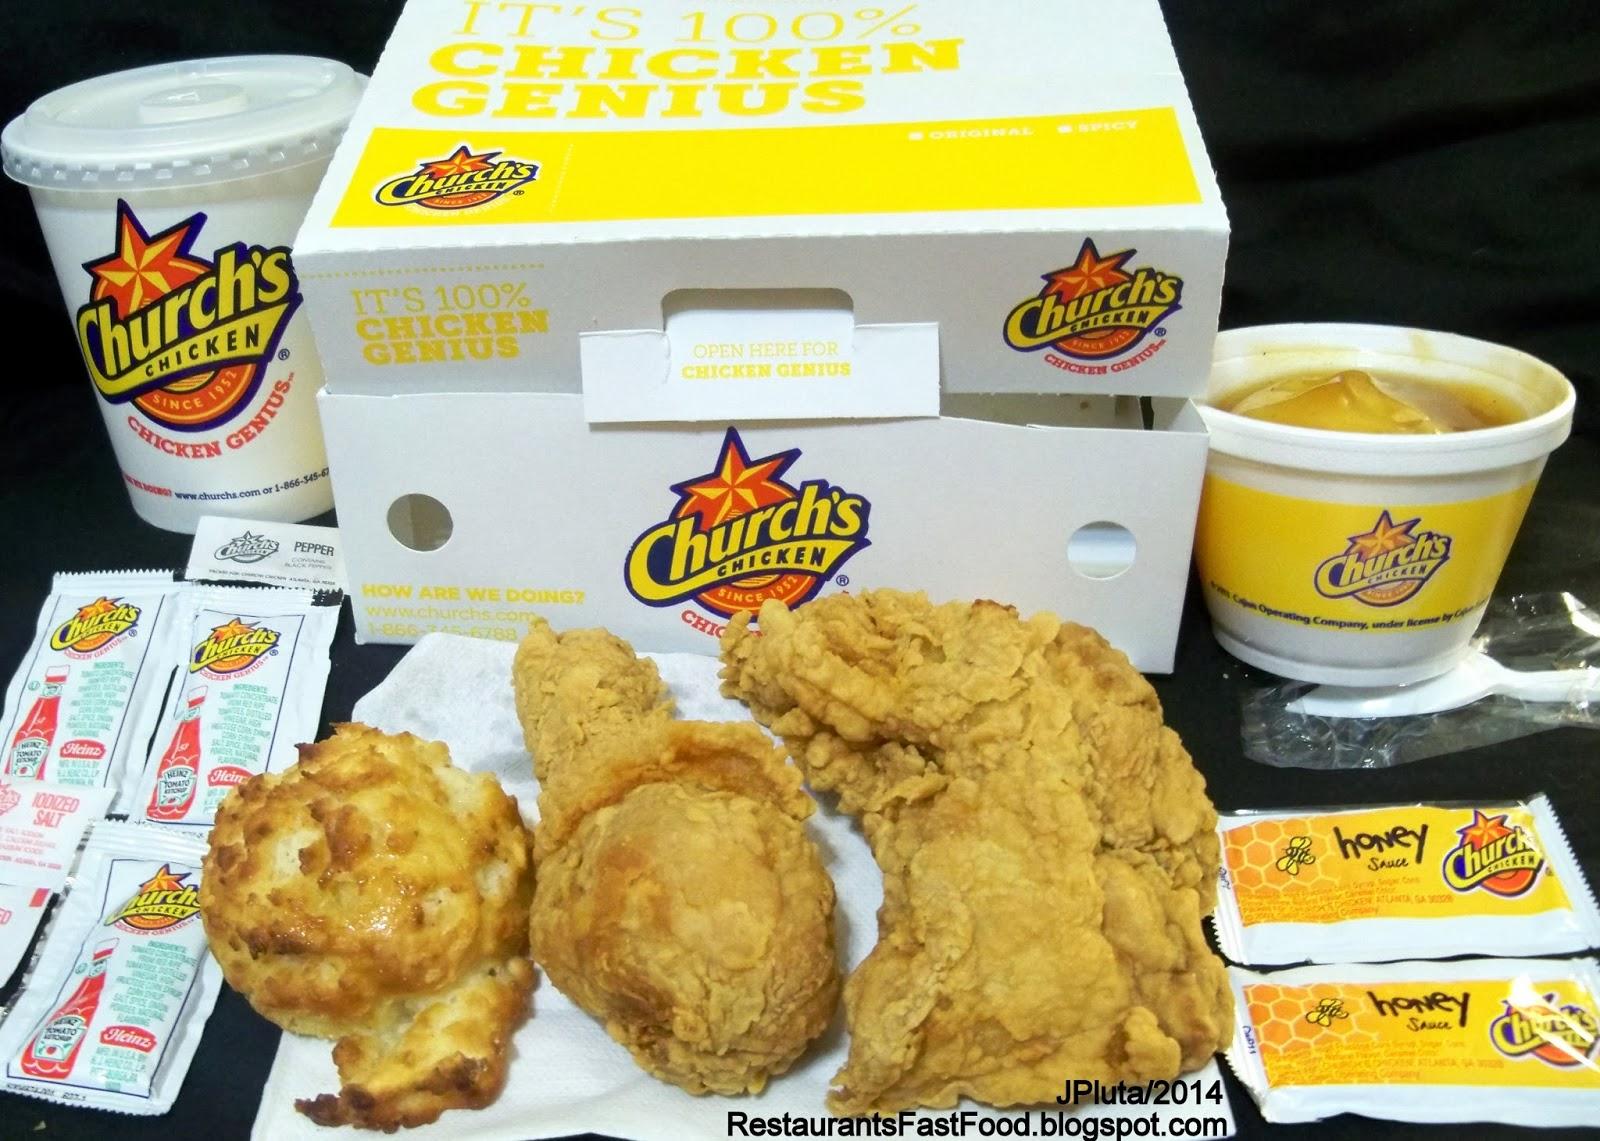 Church S En Dinner 2 Piece T Leg Mashed Potato Gravy With Ermilk Biscuit Honey Packets Fried Fast Food Restaurant